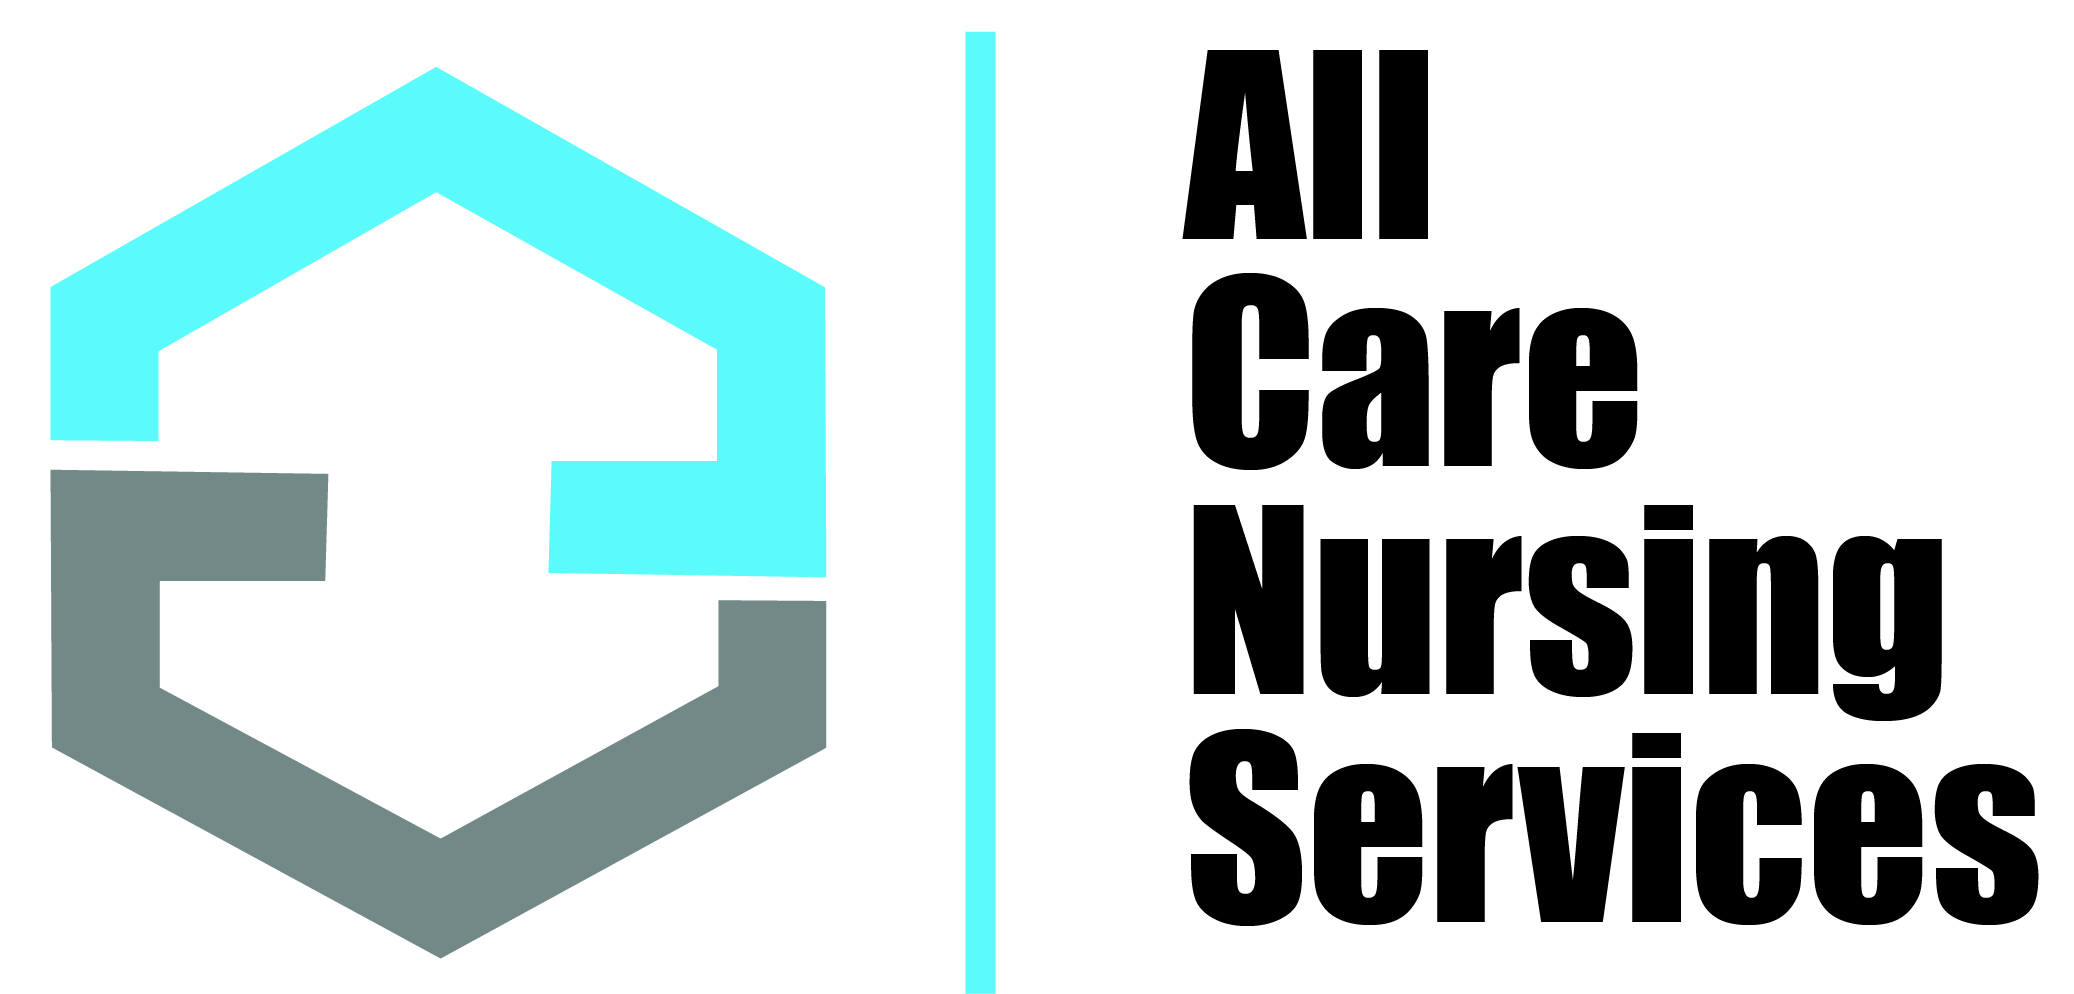 ALL CARE NURSING SERVICES INC